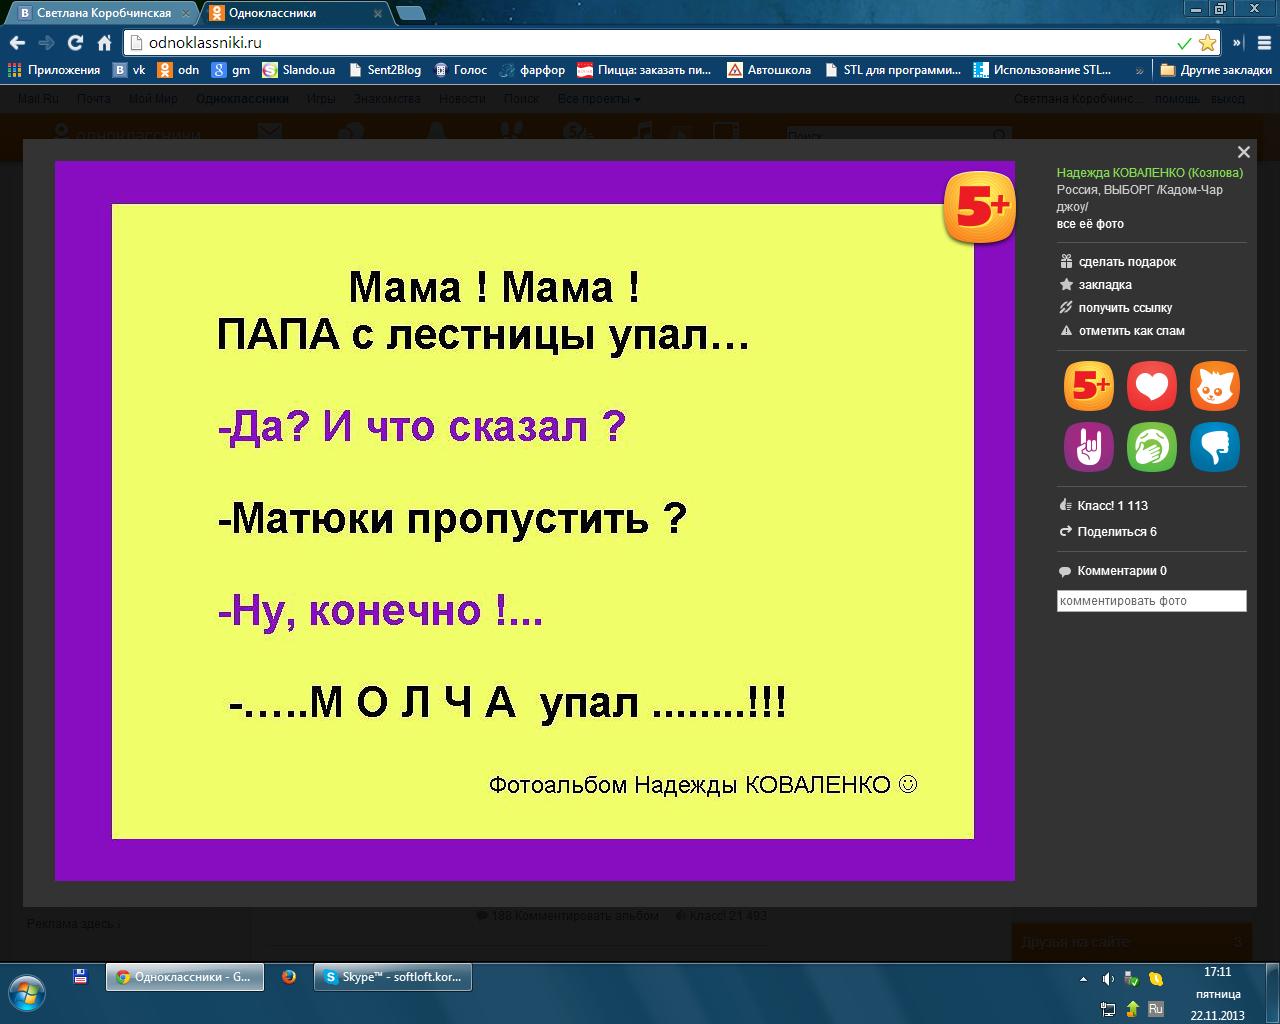 IMG_22112013_171134